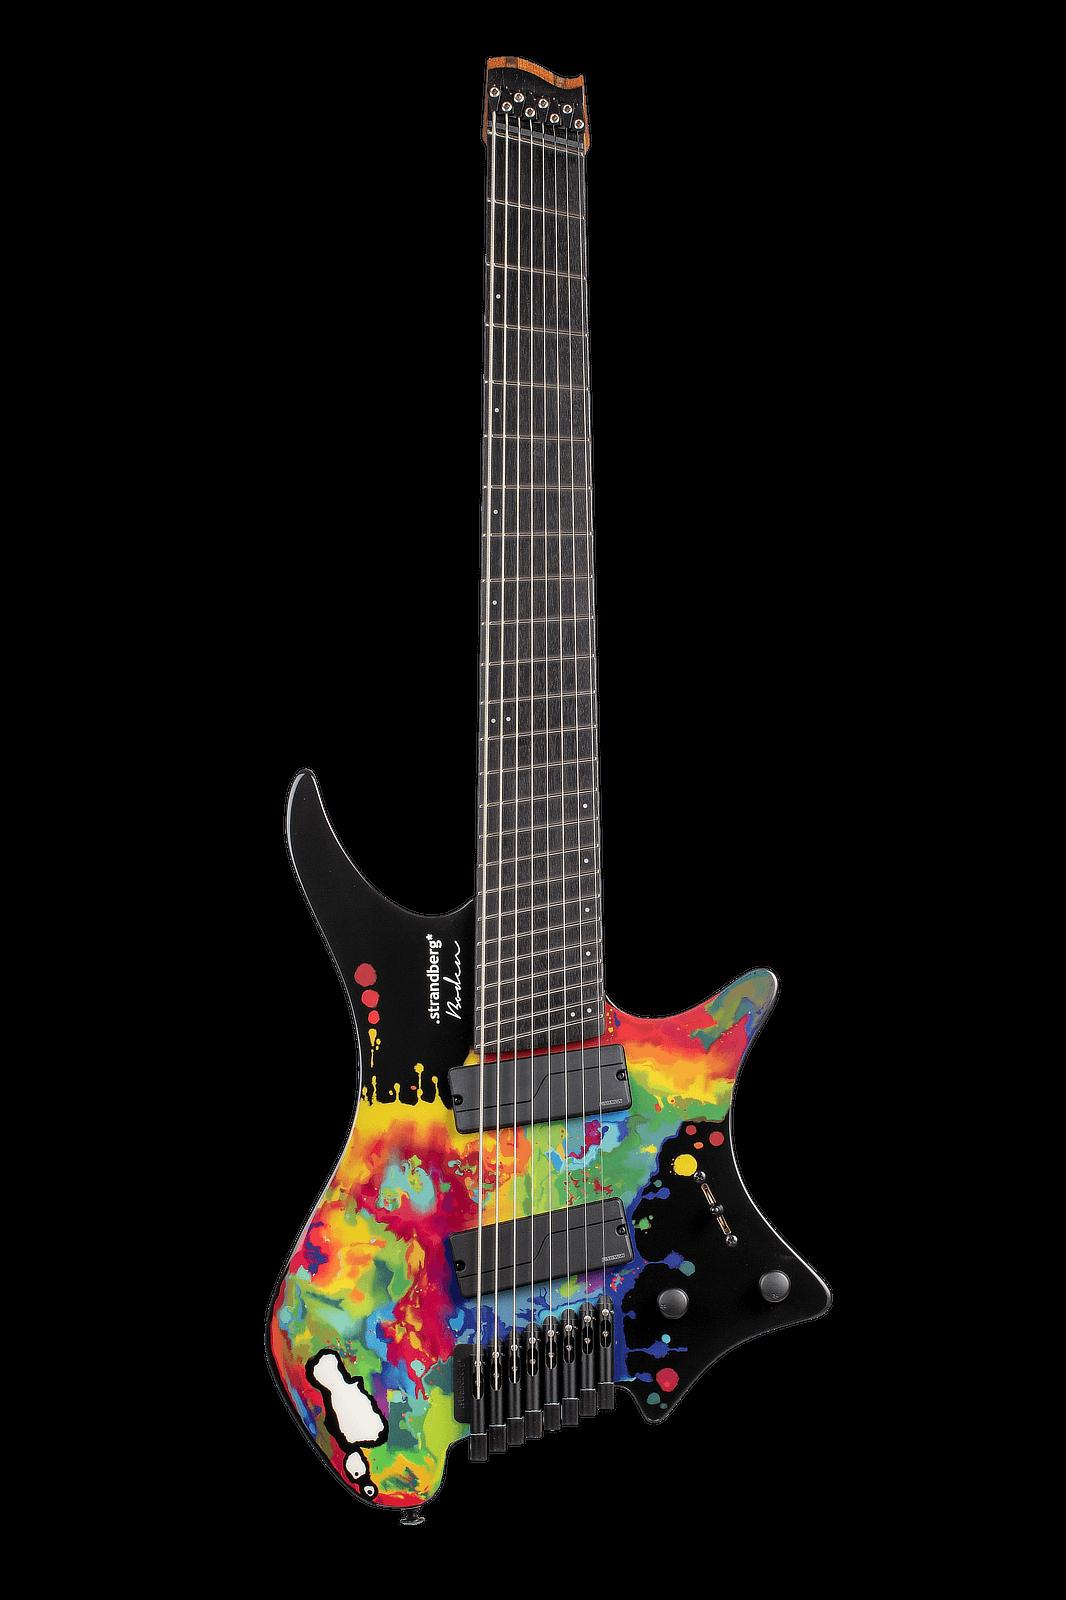 Sara Longfield 7 string headless guitar front view